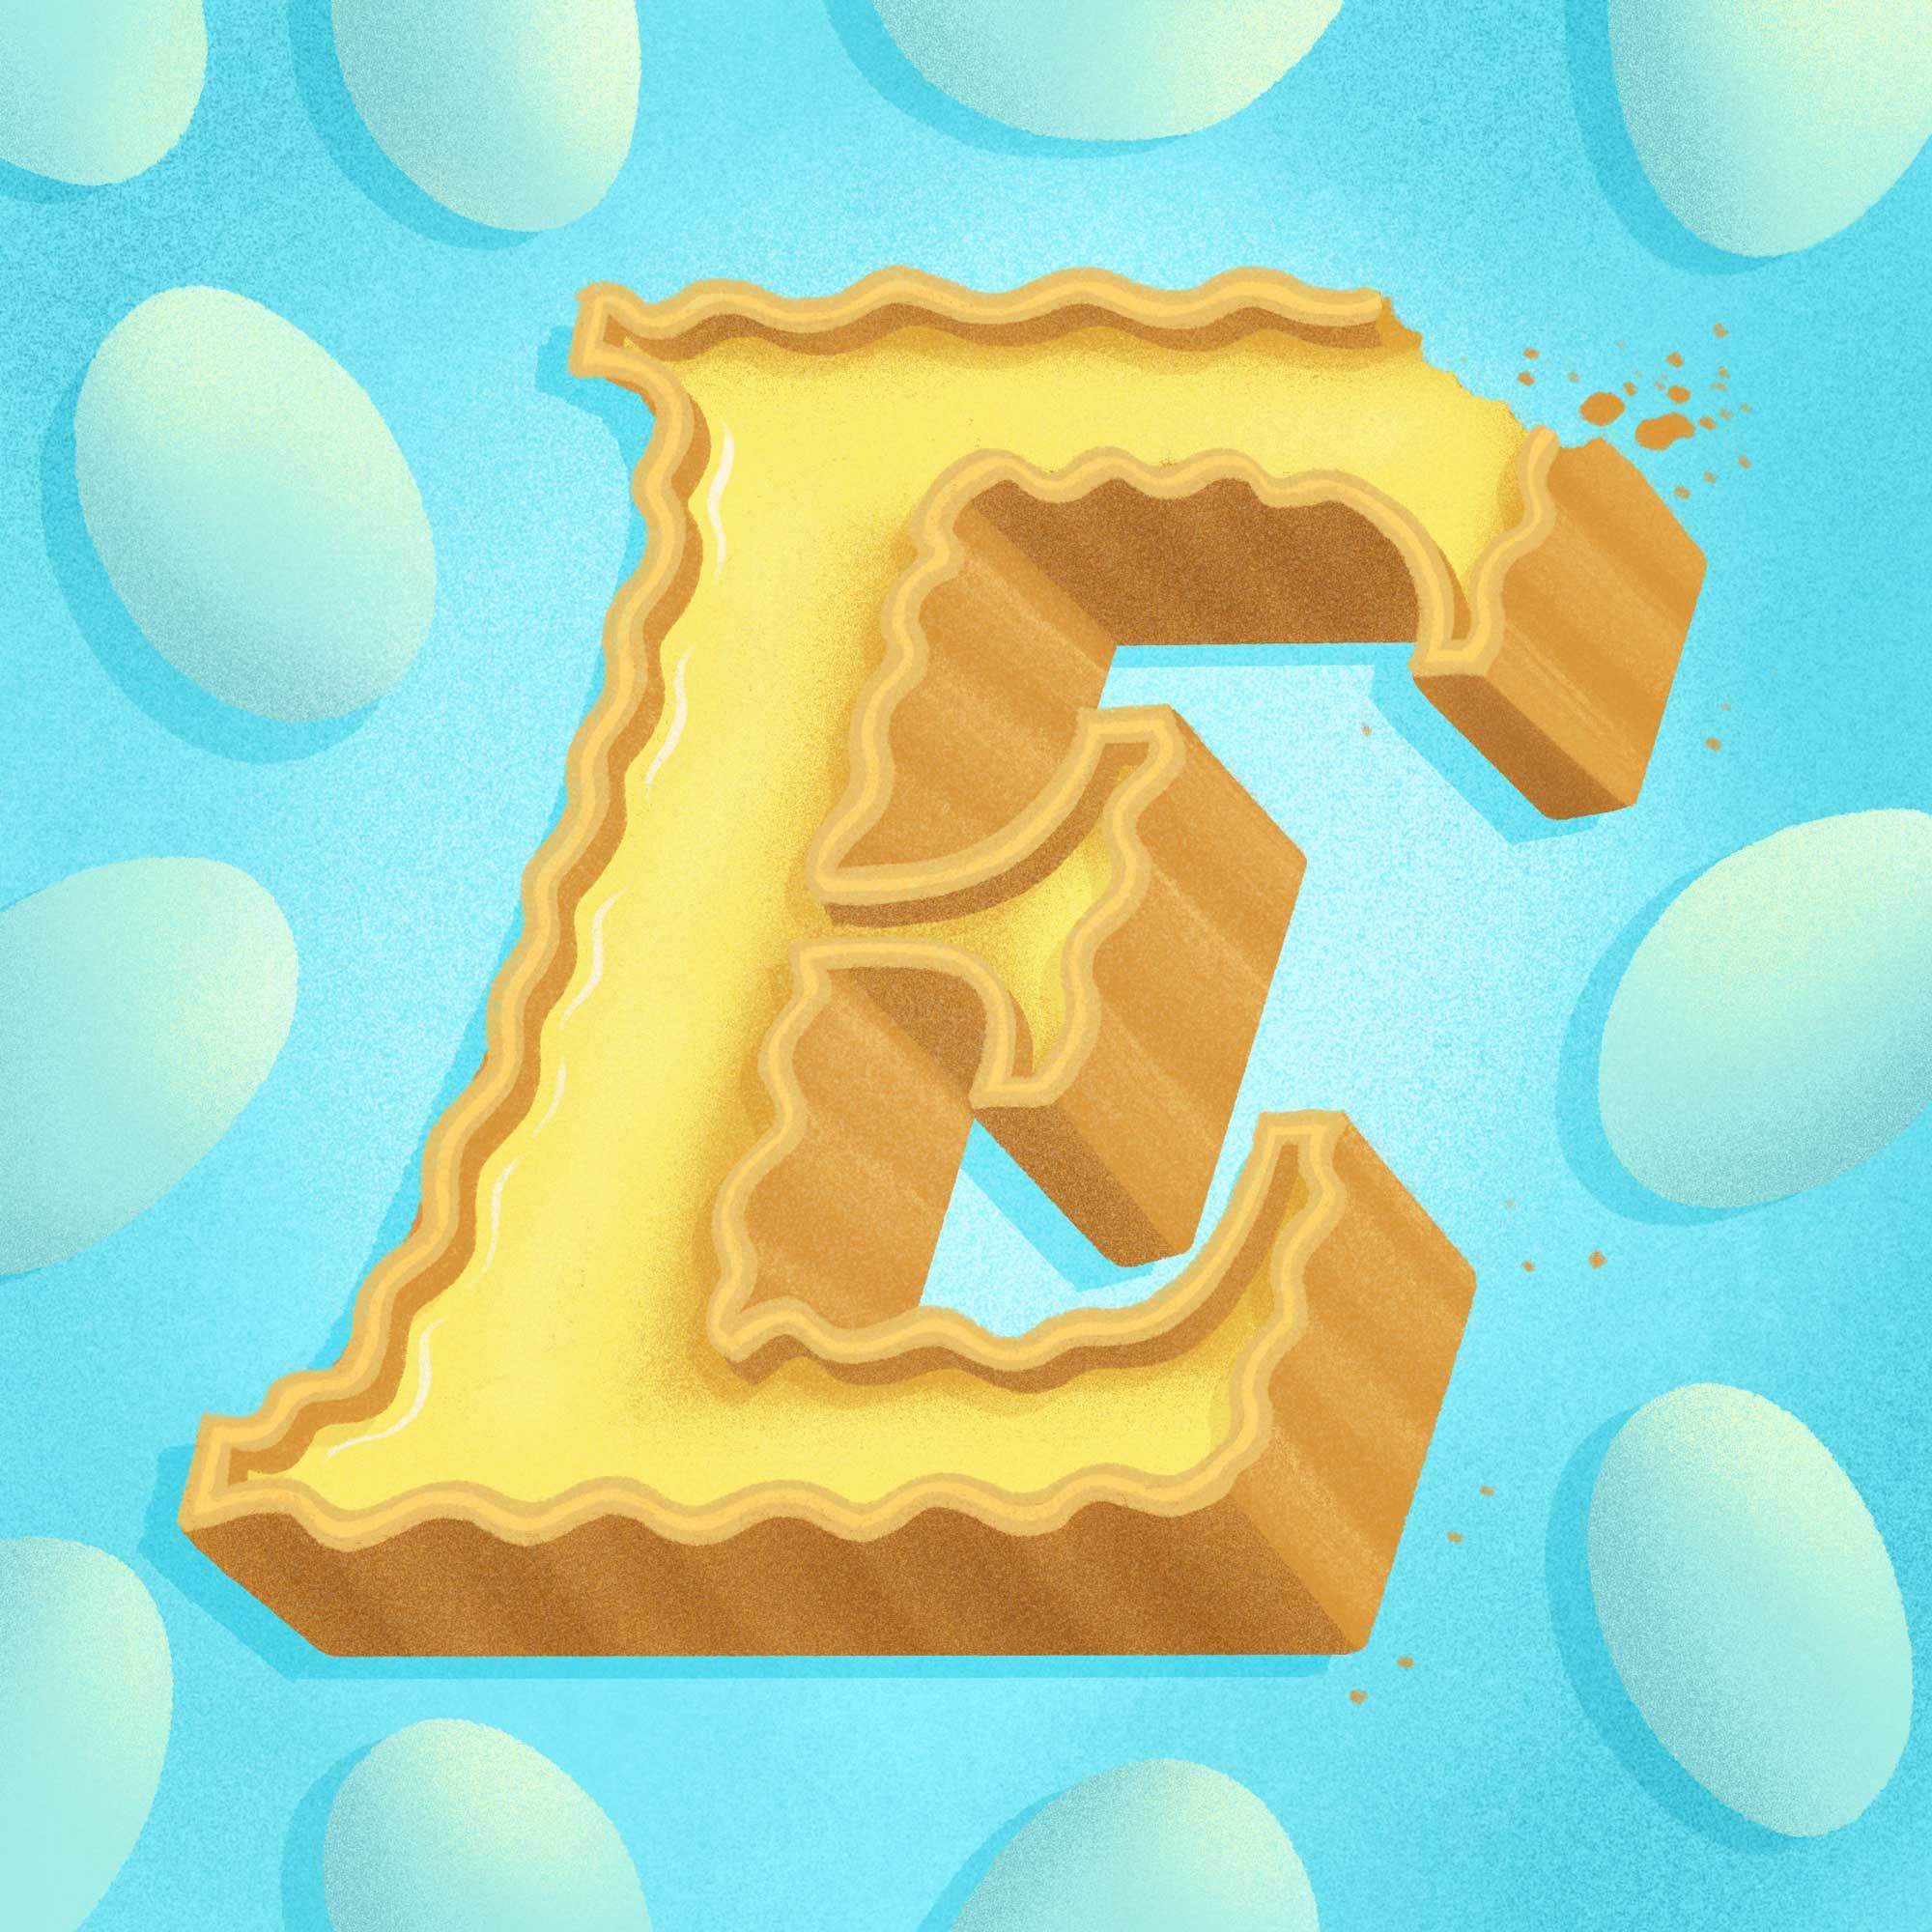 36 Days of Sweet Type, a hand lettered and illustrated dessert and food alphabet. Letter E illustration for egg tart. | Belinda Kou Lettering, Illustration & Design | Chicago artist